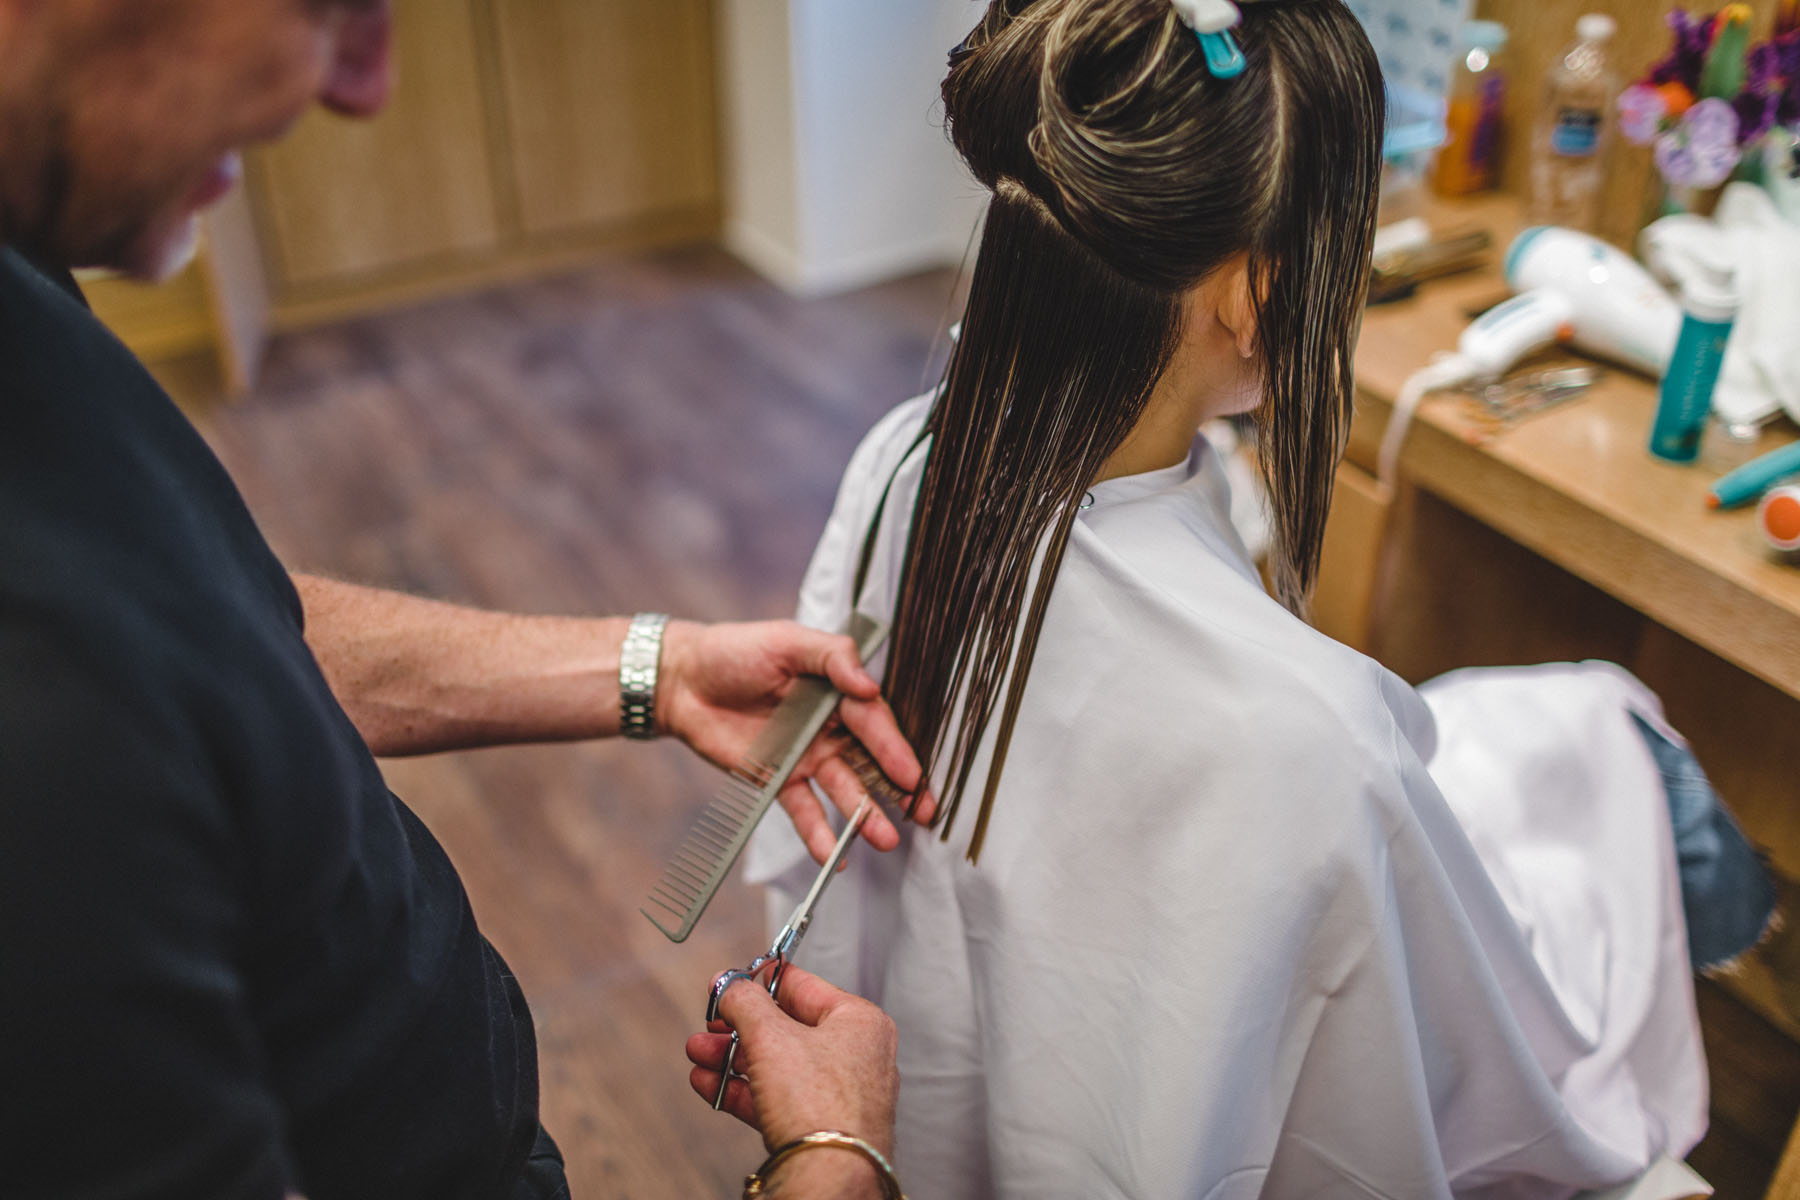 How to Achieve Long Lasting Hair Color - Moroccanoil Color Complete Collection Review, Foilyage hair, Foilyage hair technique // Notjessfashion.com